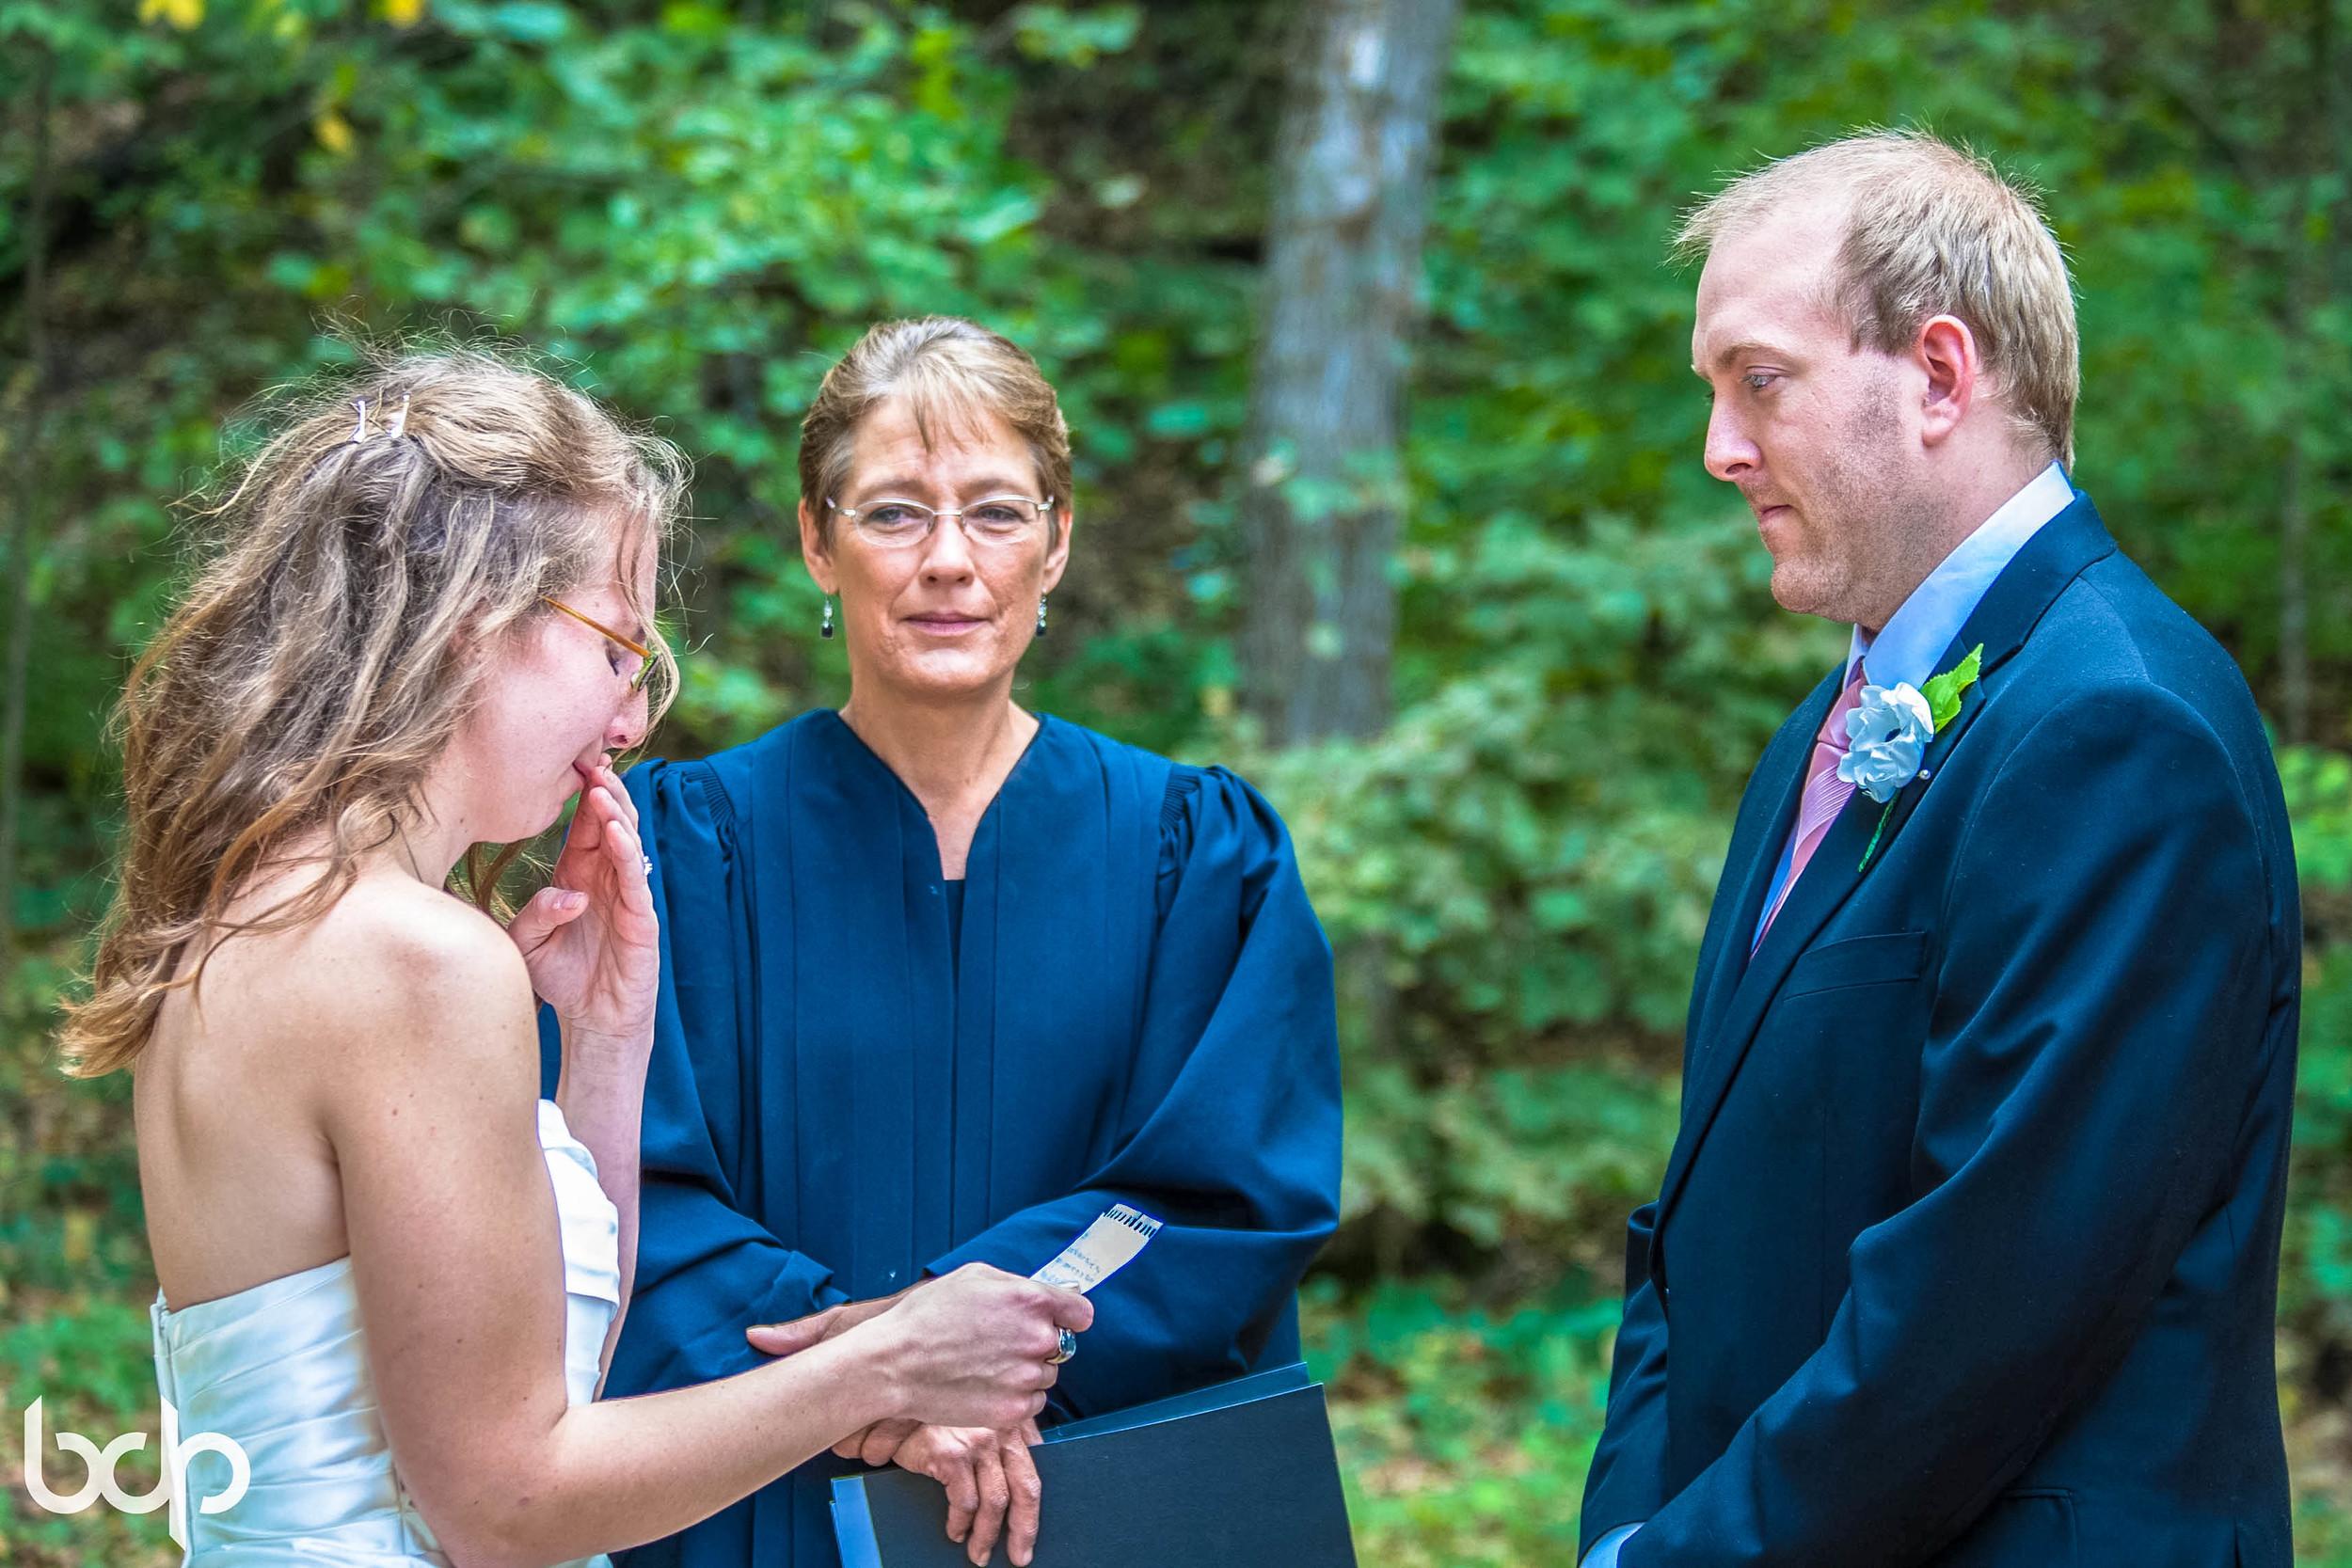 Scott and Rena's Wedding 090812 BDP SQ-12.jpg